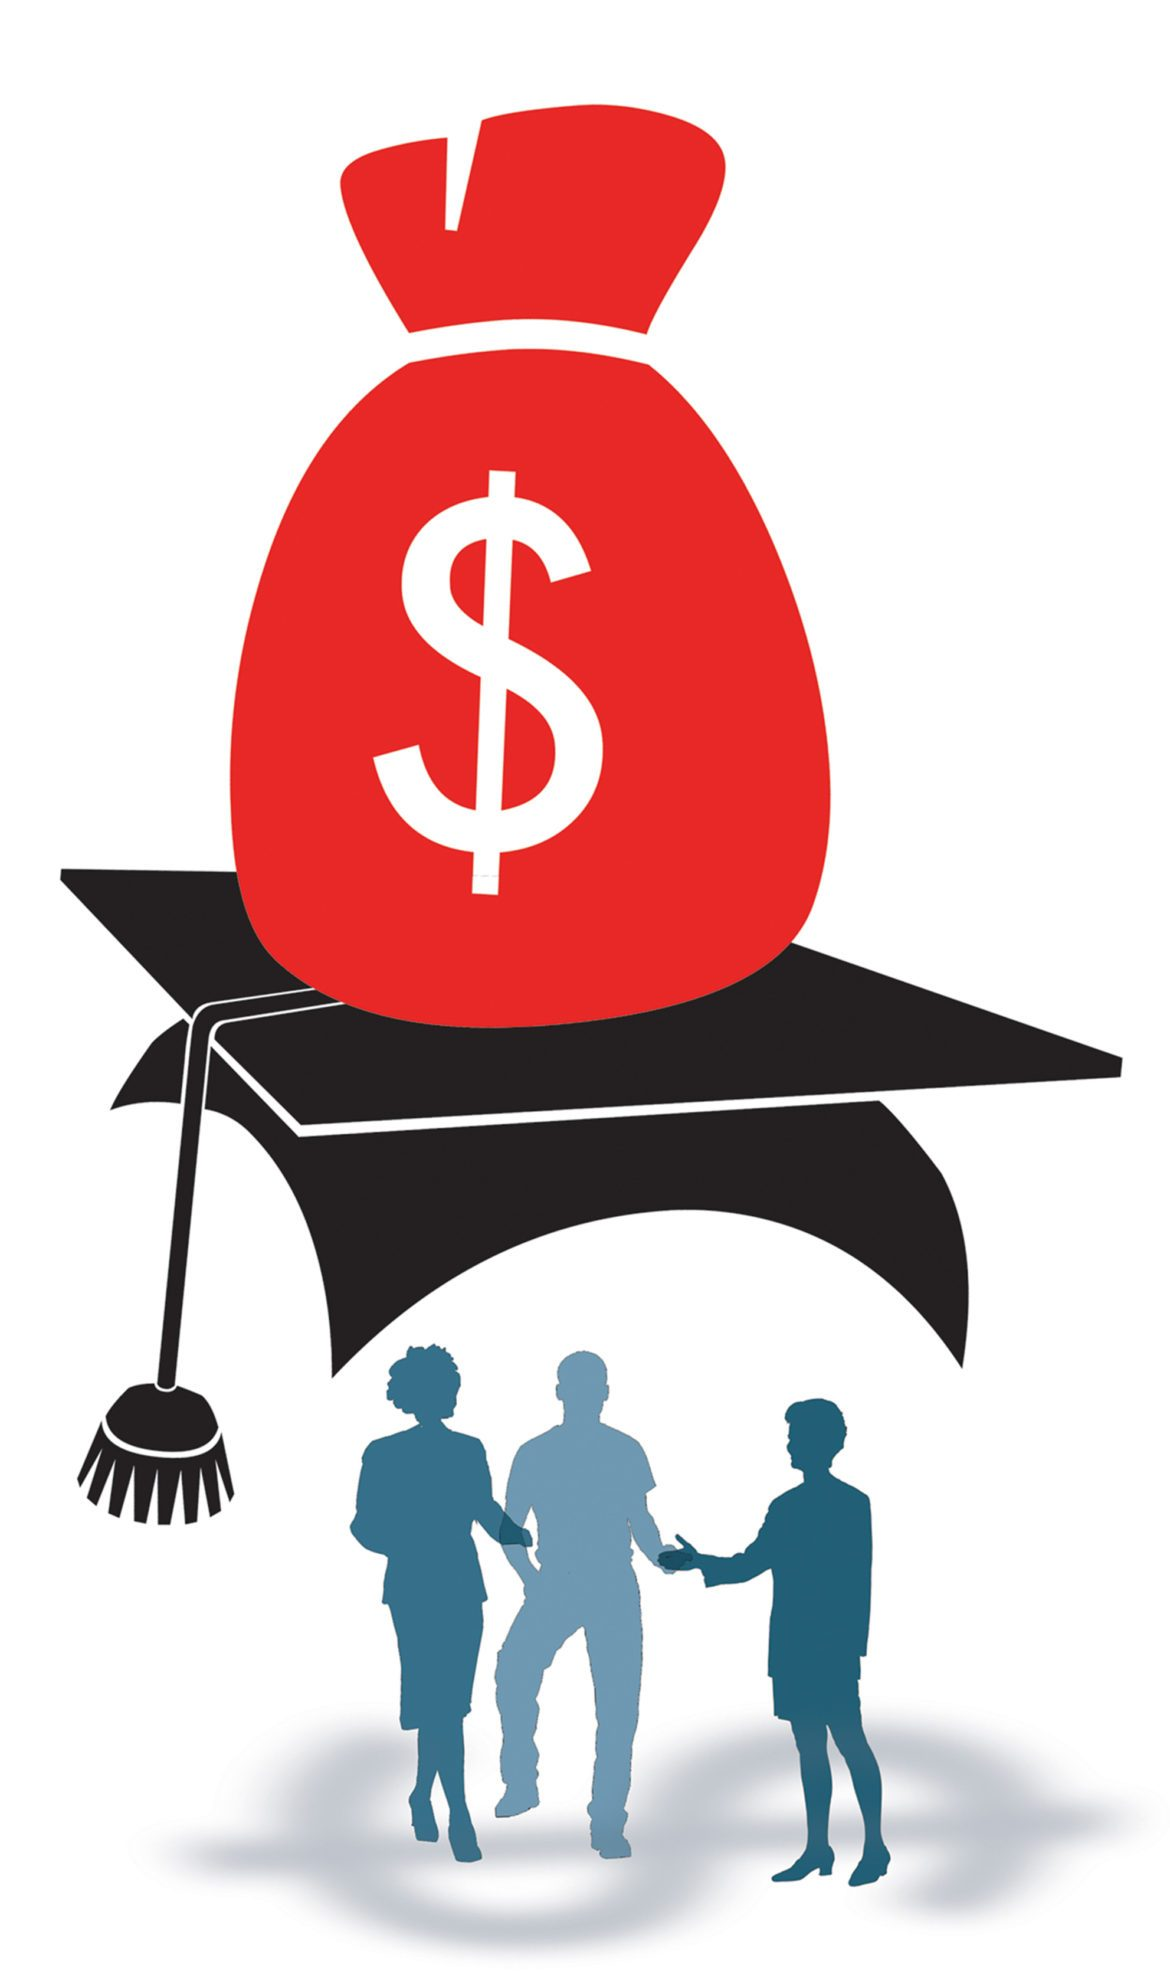 graphic+shows+a+big+money+bag+on+top+of+a+graduation+cap